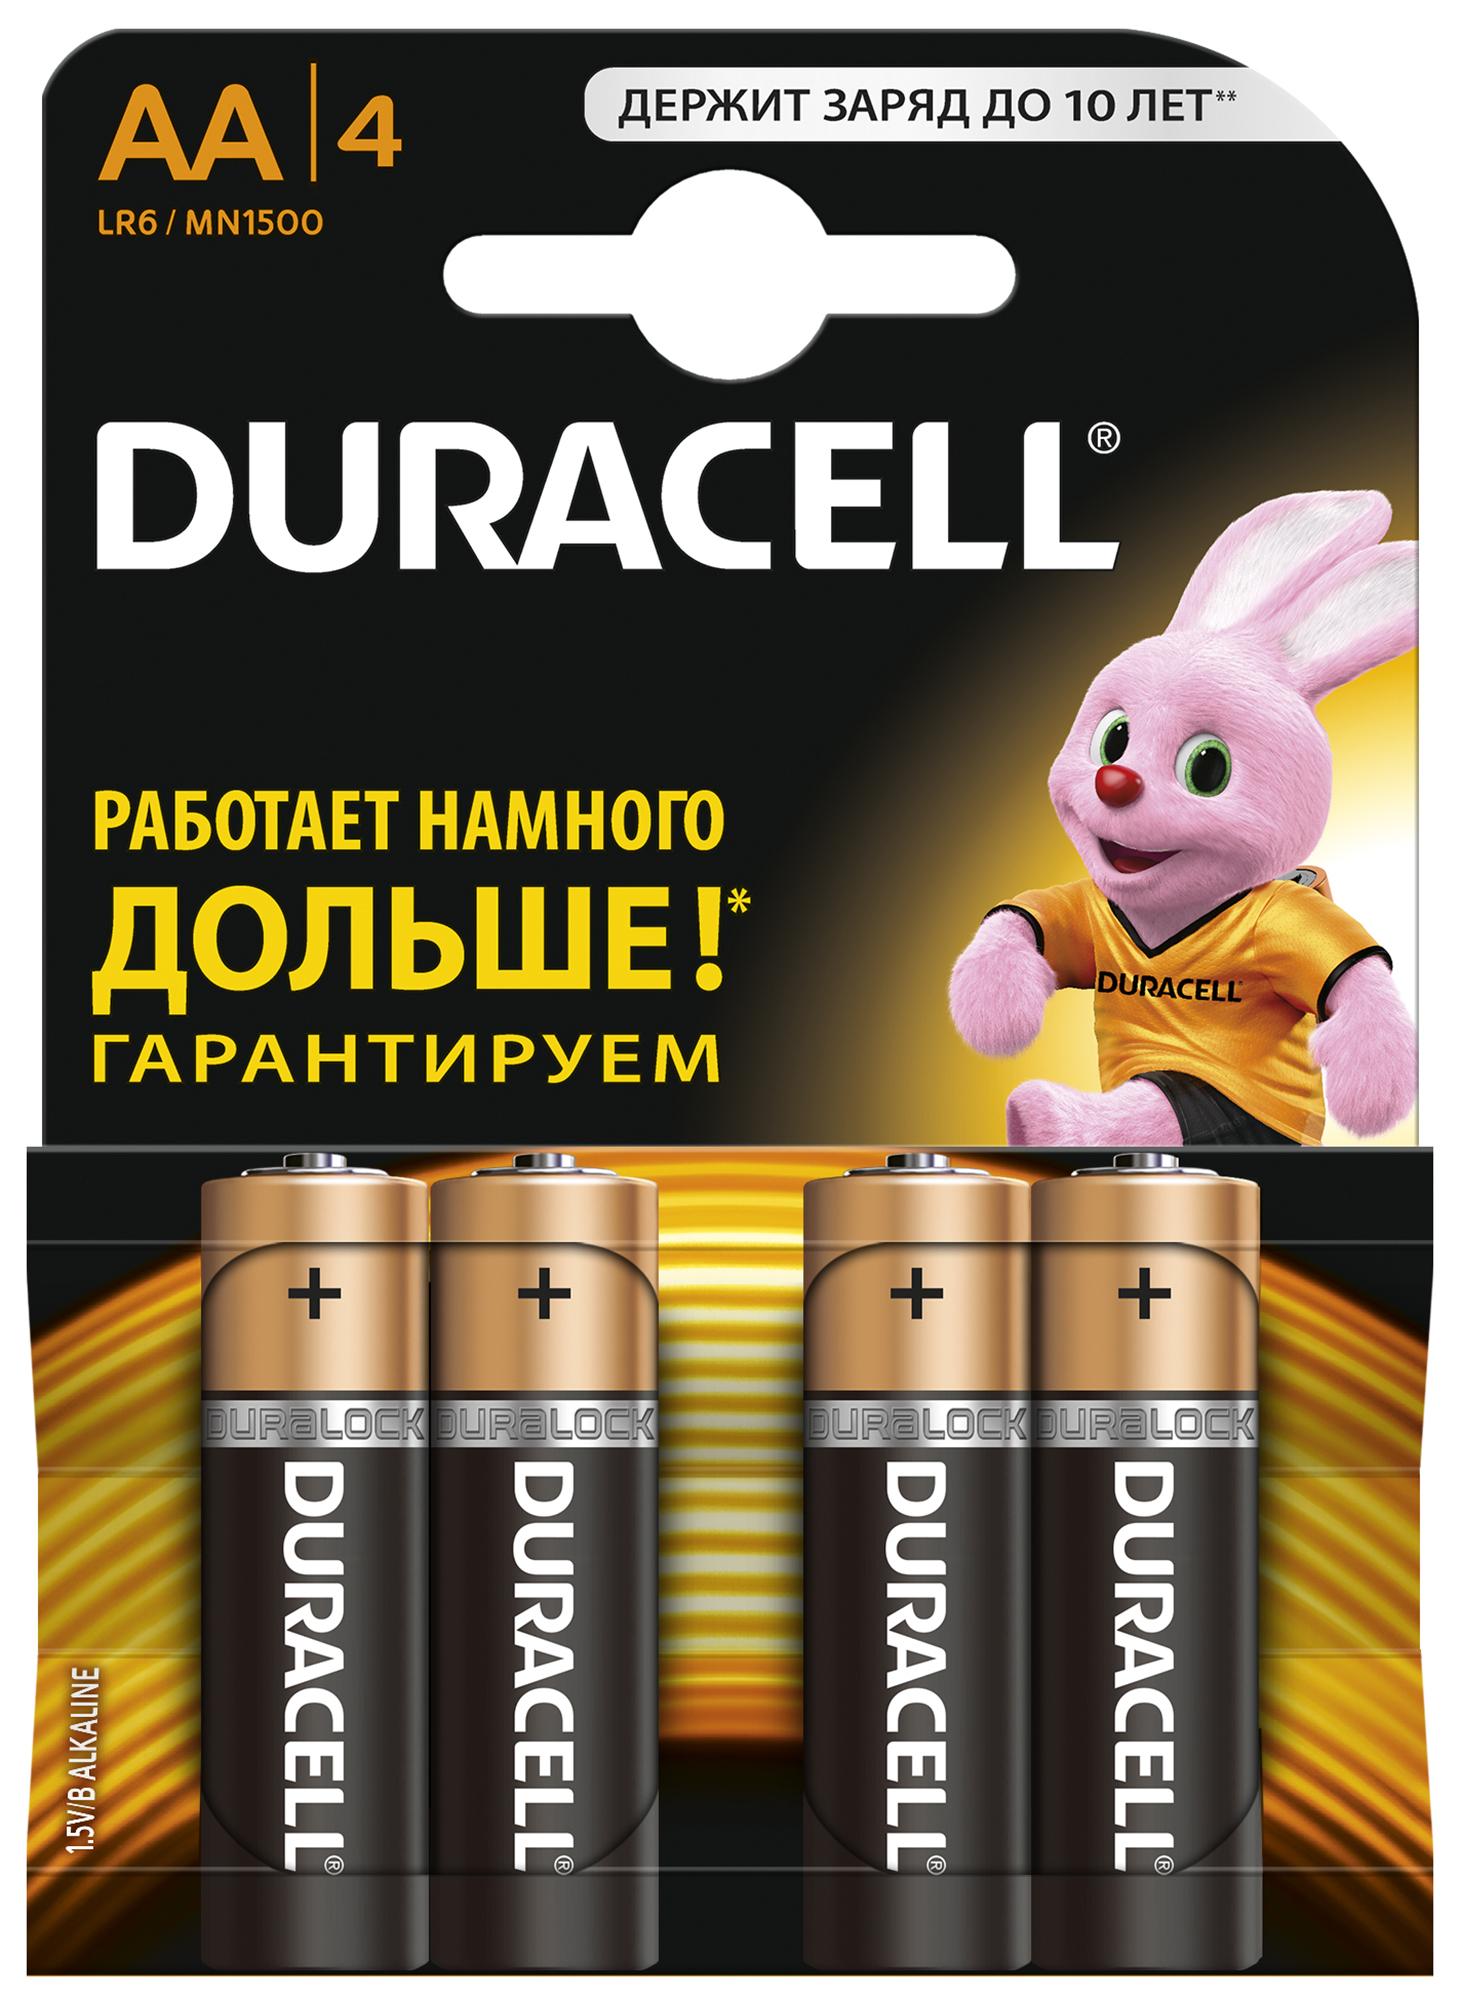 Duracell Батарейки щелочные Duracell Basic AA/LR06, 4 шт. аккумуляторы duracell hr06 aa